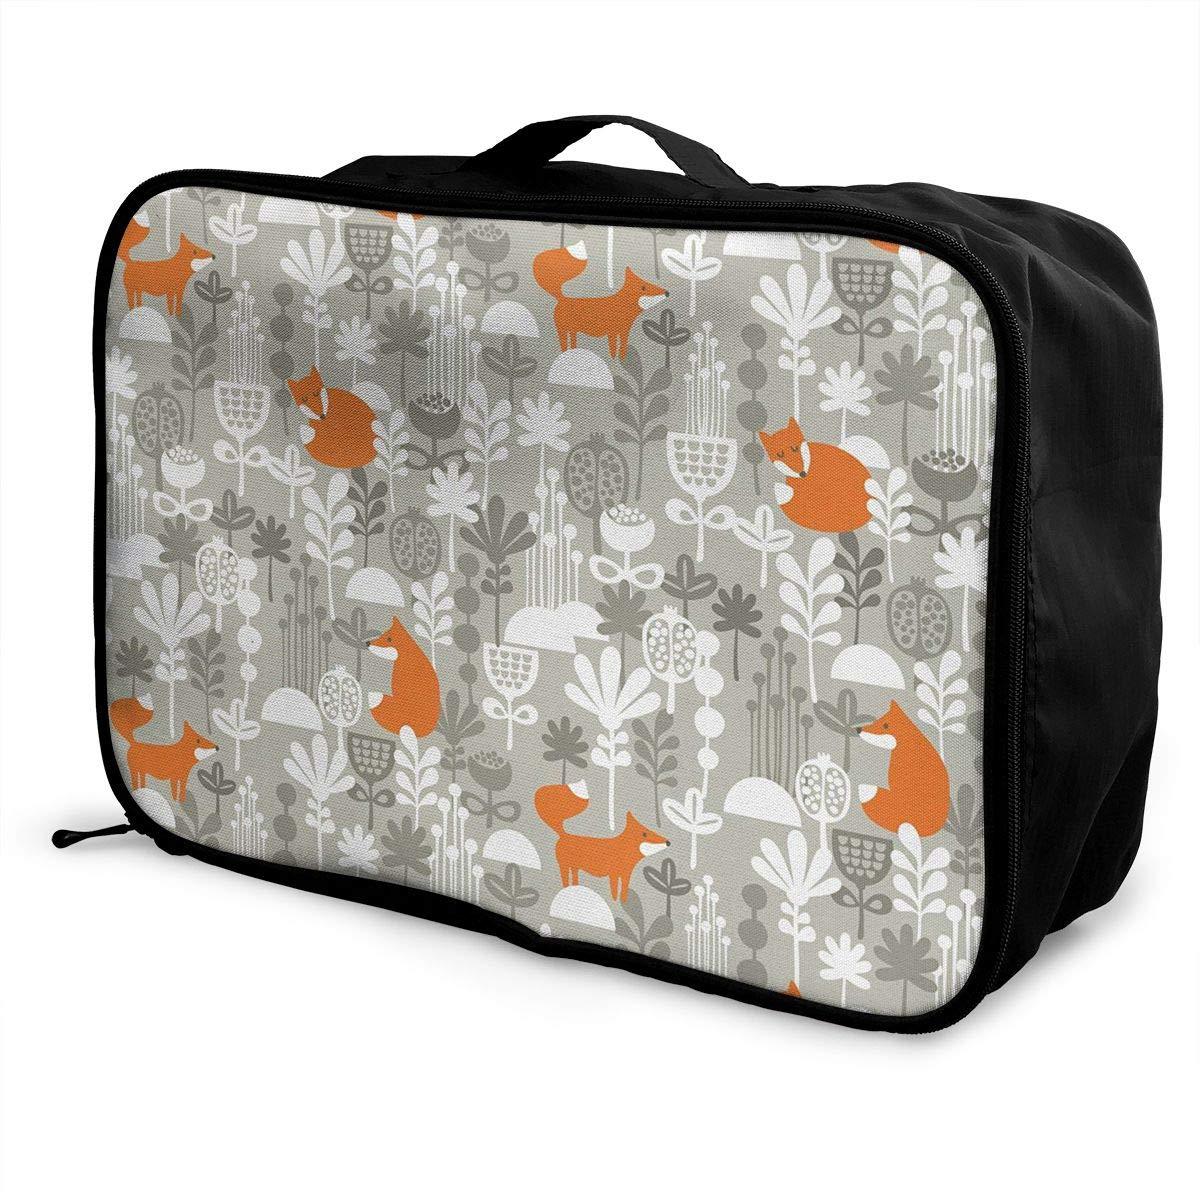 ADGAI Small Animals of The European Canvas Travel Weekender Bag,Fashion Custom Lightweight Large Capacity Portable Luggage Bag,Suitcase Trolley Bag